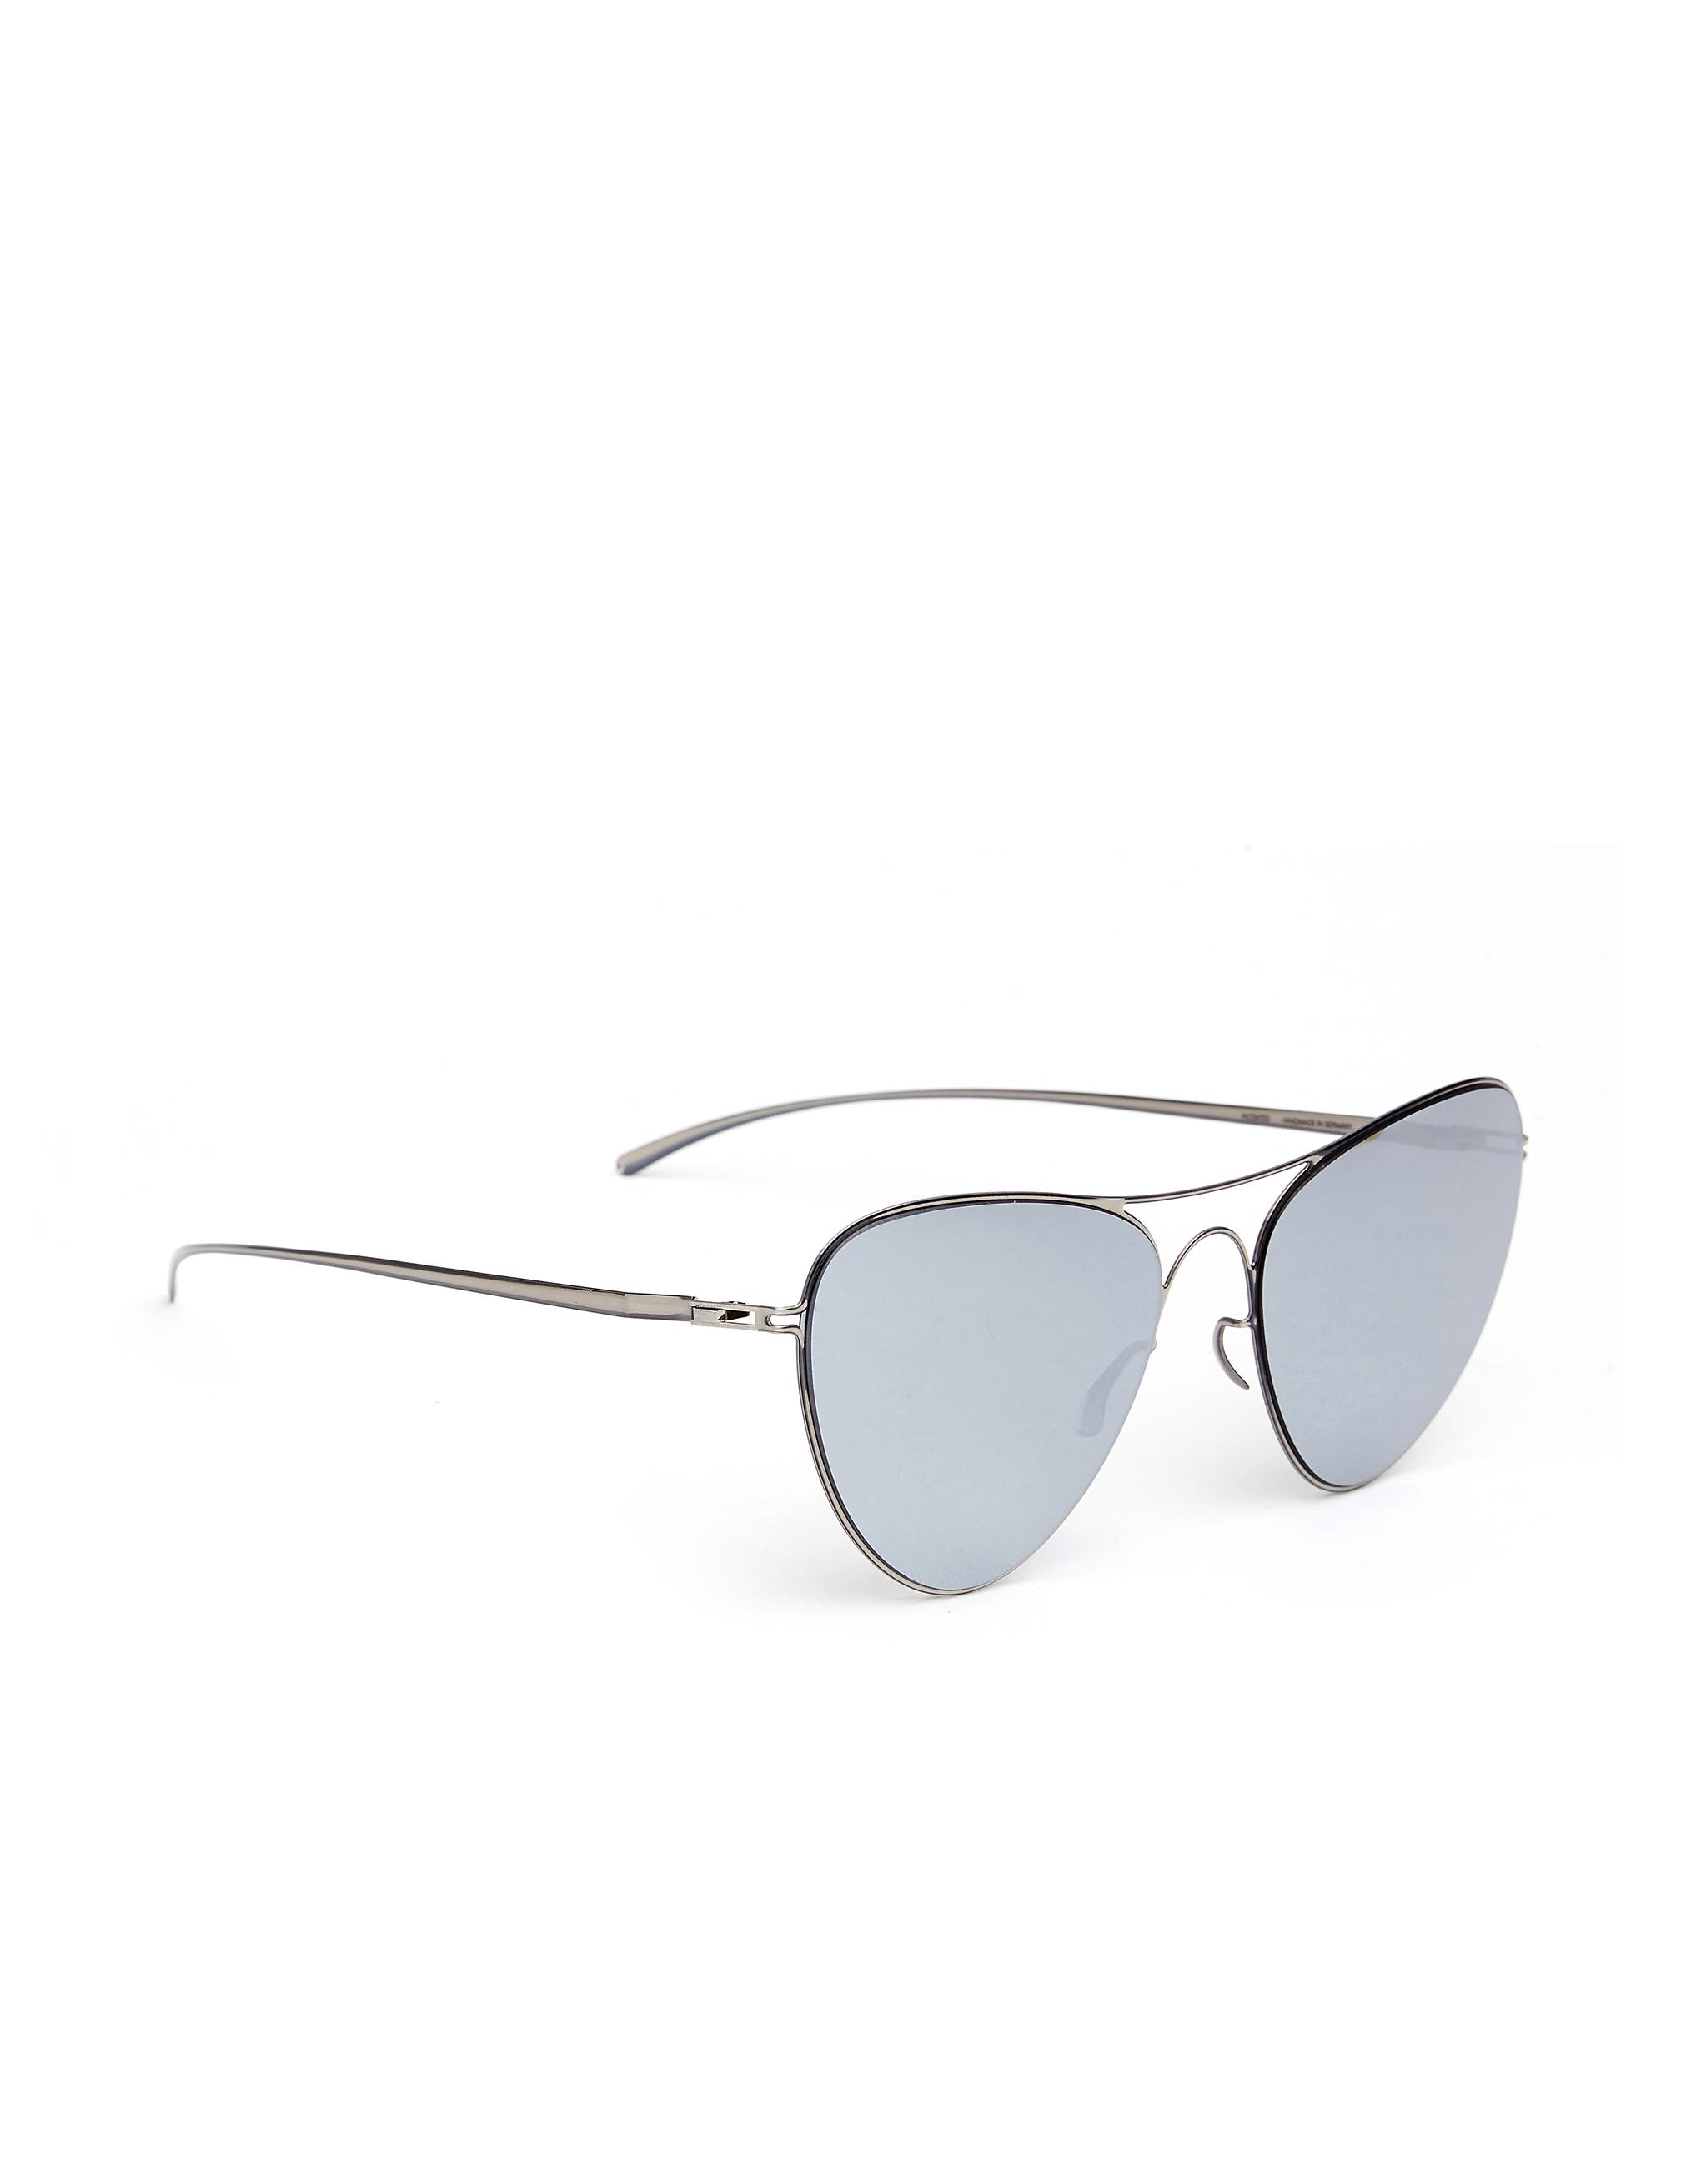 Mykita Mykita x Maison Margiela sunglasses